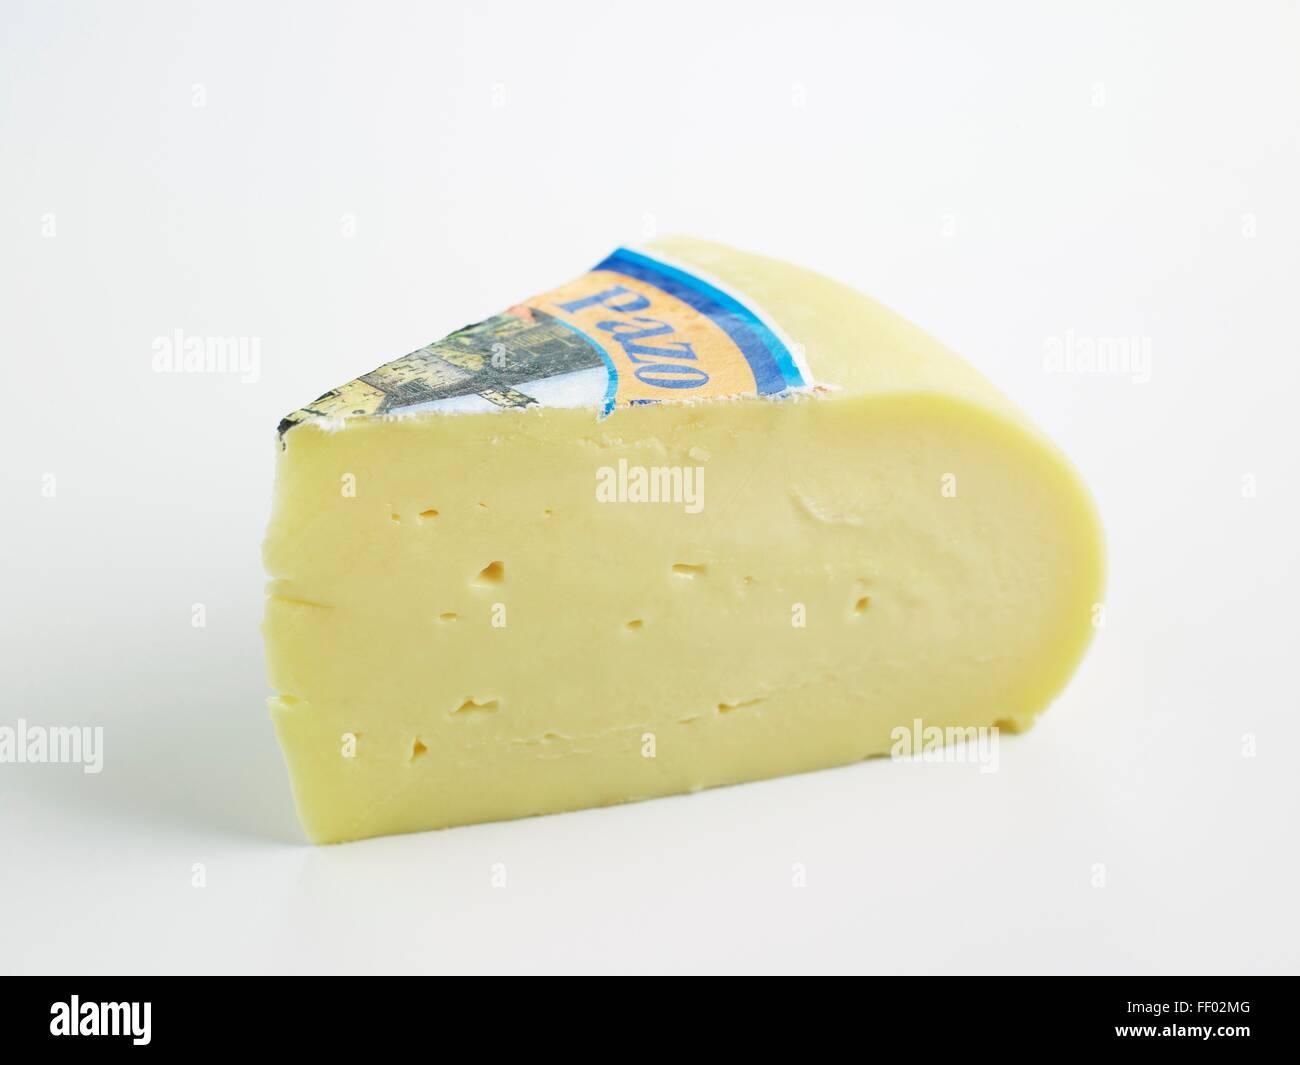 Slice of Spanish Arzua-Ulloa DOP cow's milk cheese - Stock Image